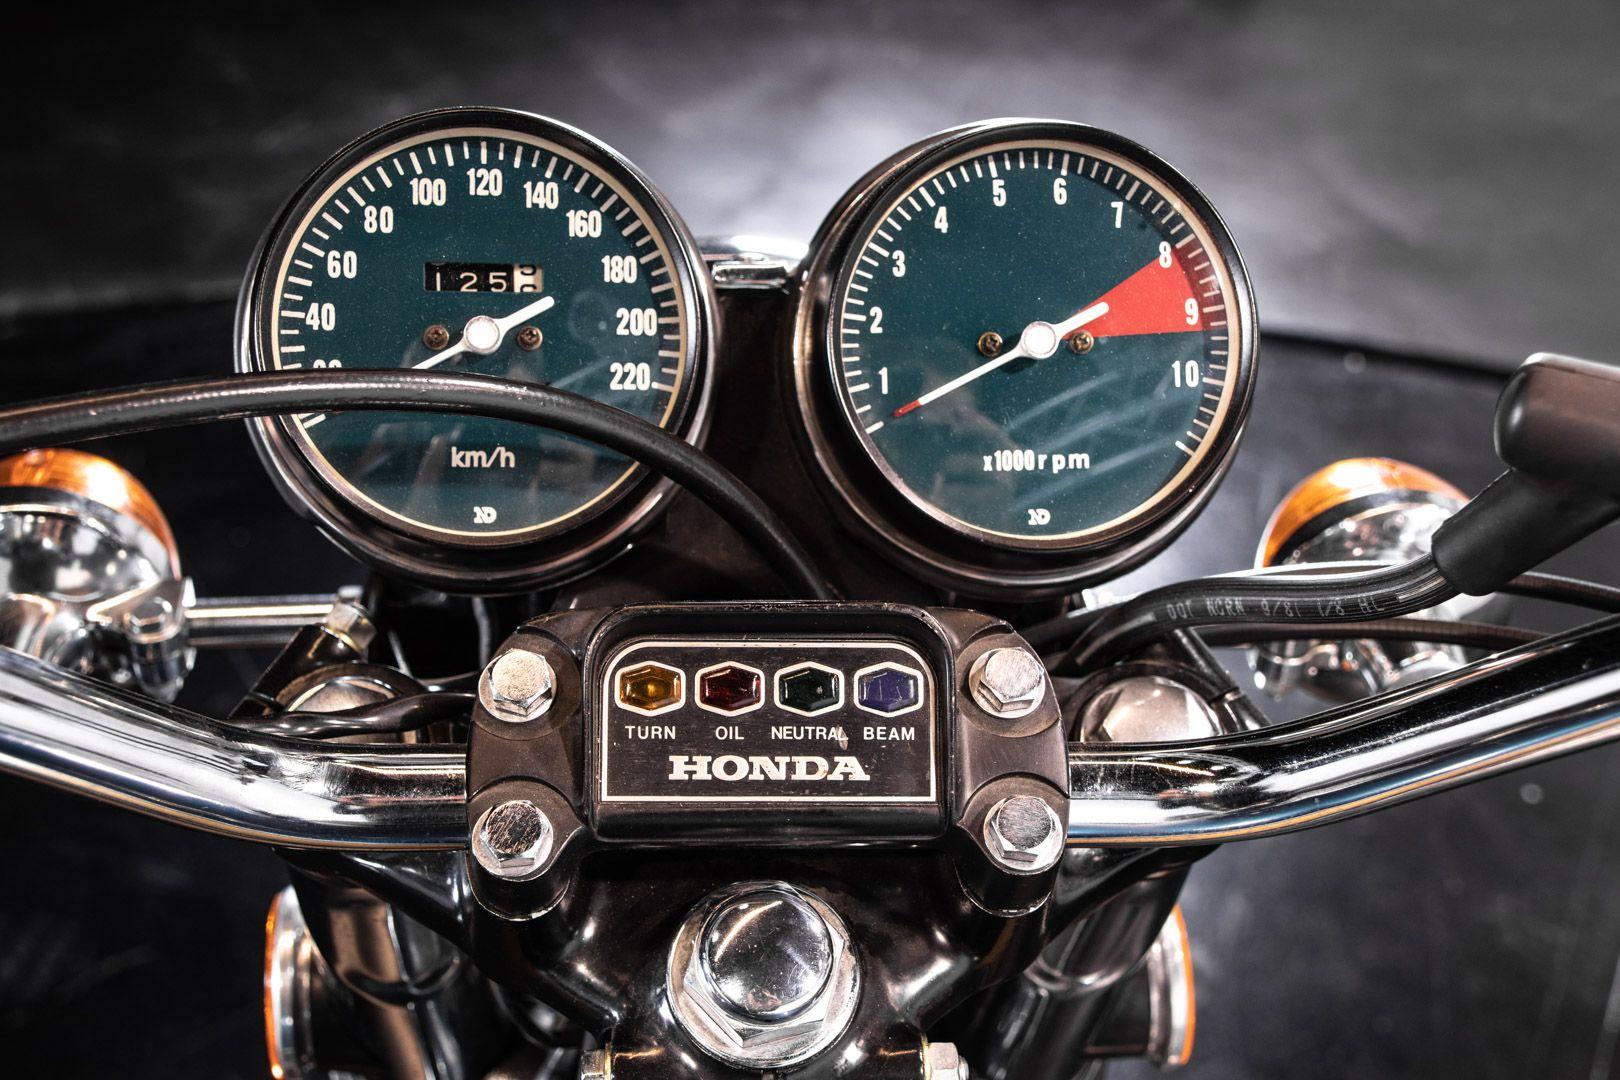 1972 Honda CB 750 Four G K2 83950